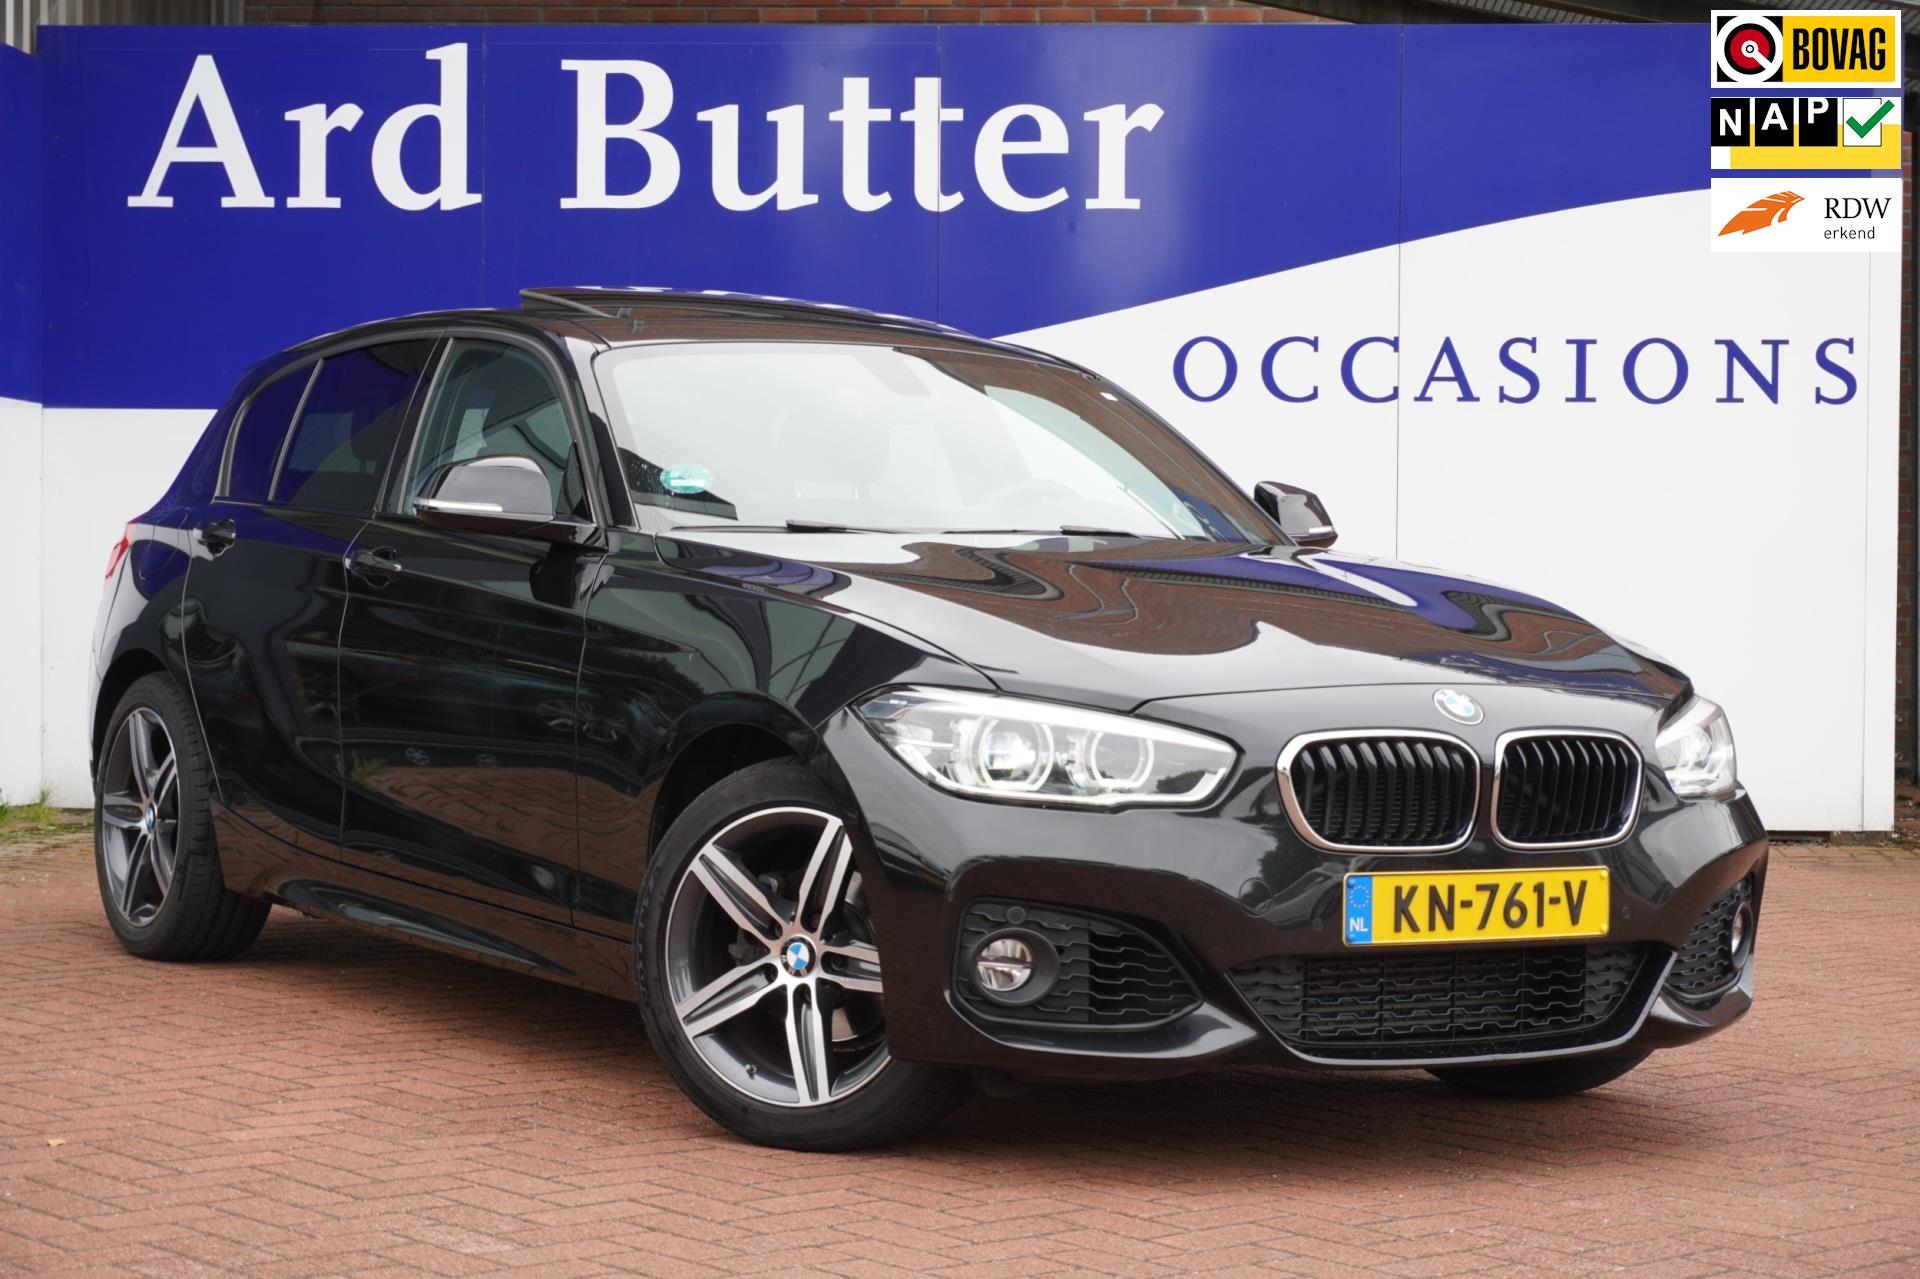 BMW 1-serie occasion - Autobedrijf Ard Butter B.V.